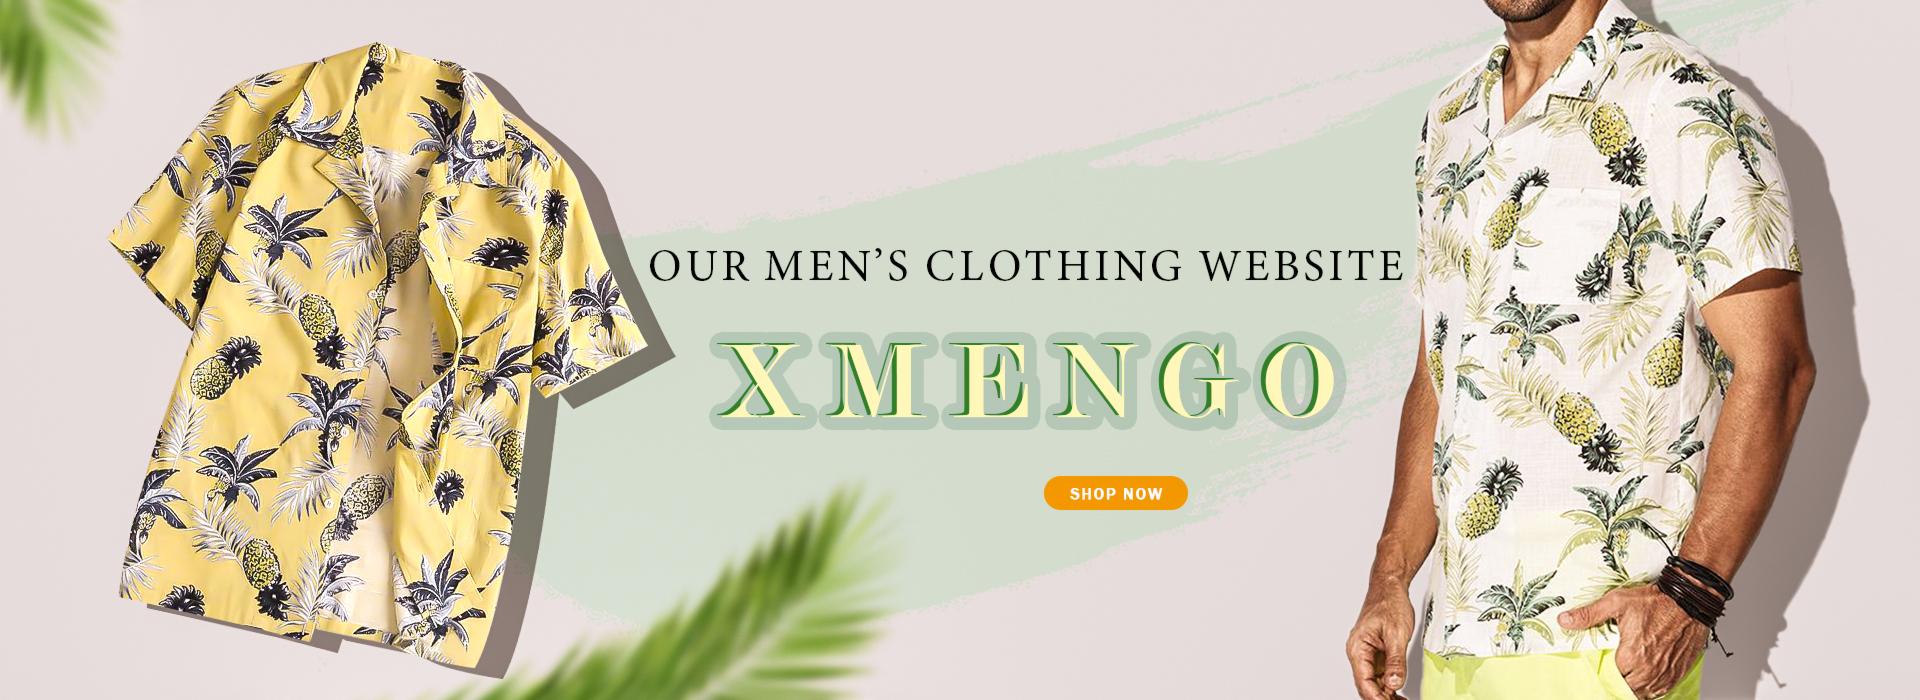 https://www.xmengo.com/